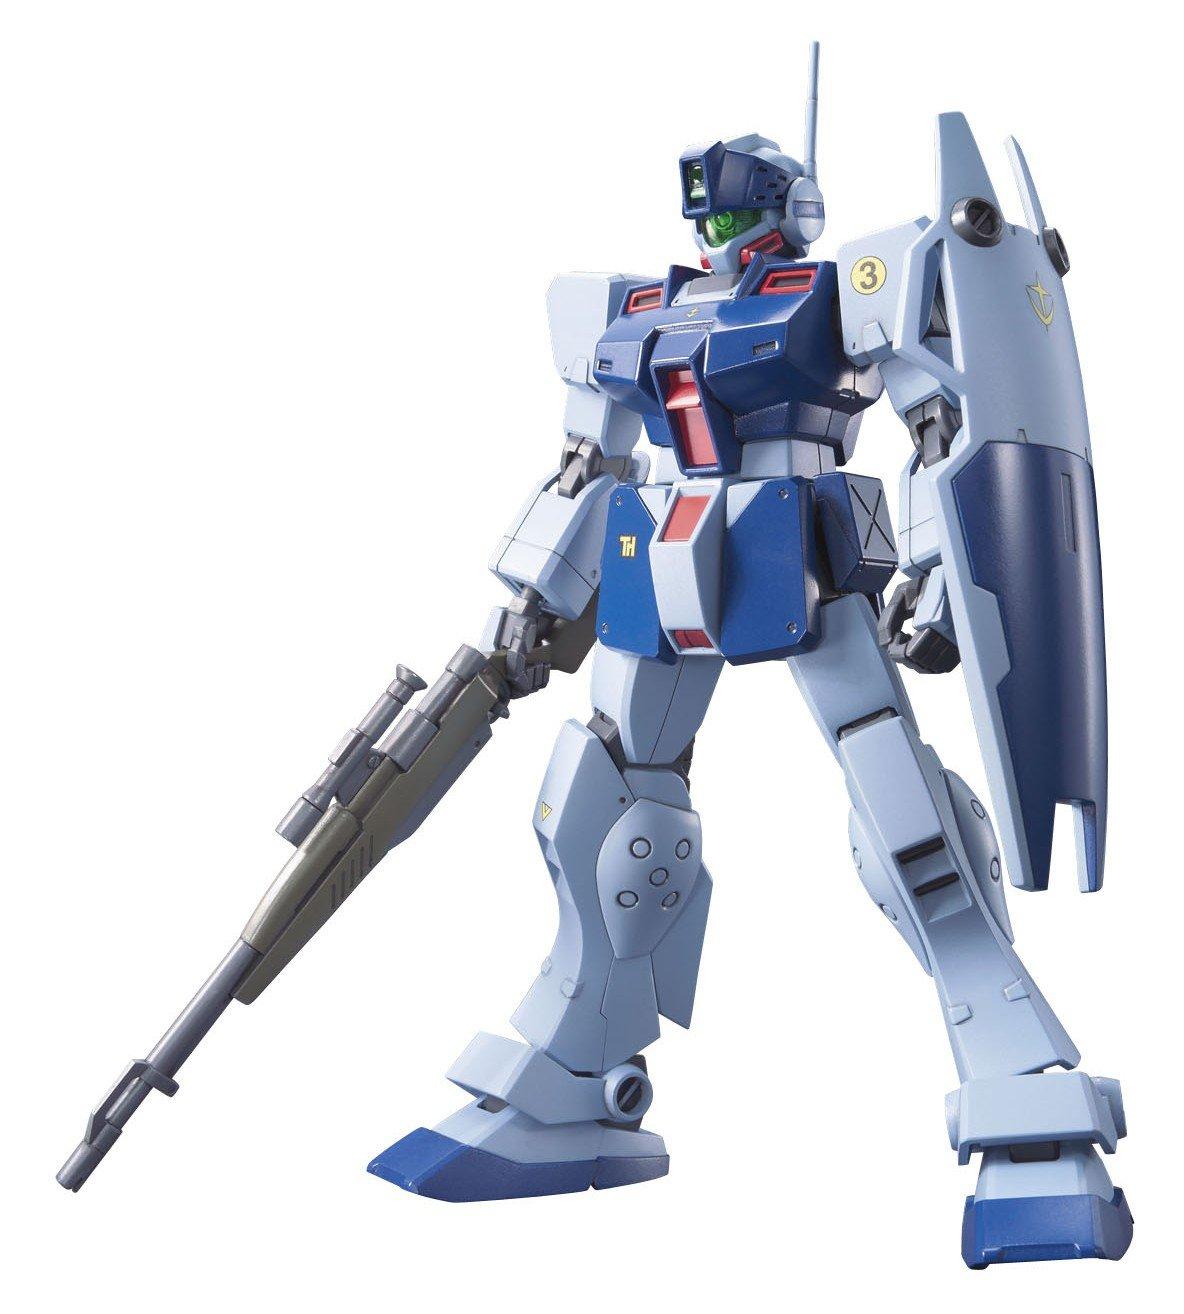 Bandai Hobby #146 GM Sniper II 1/144th HGUC Action Figure